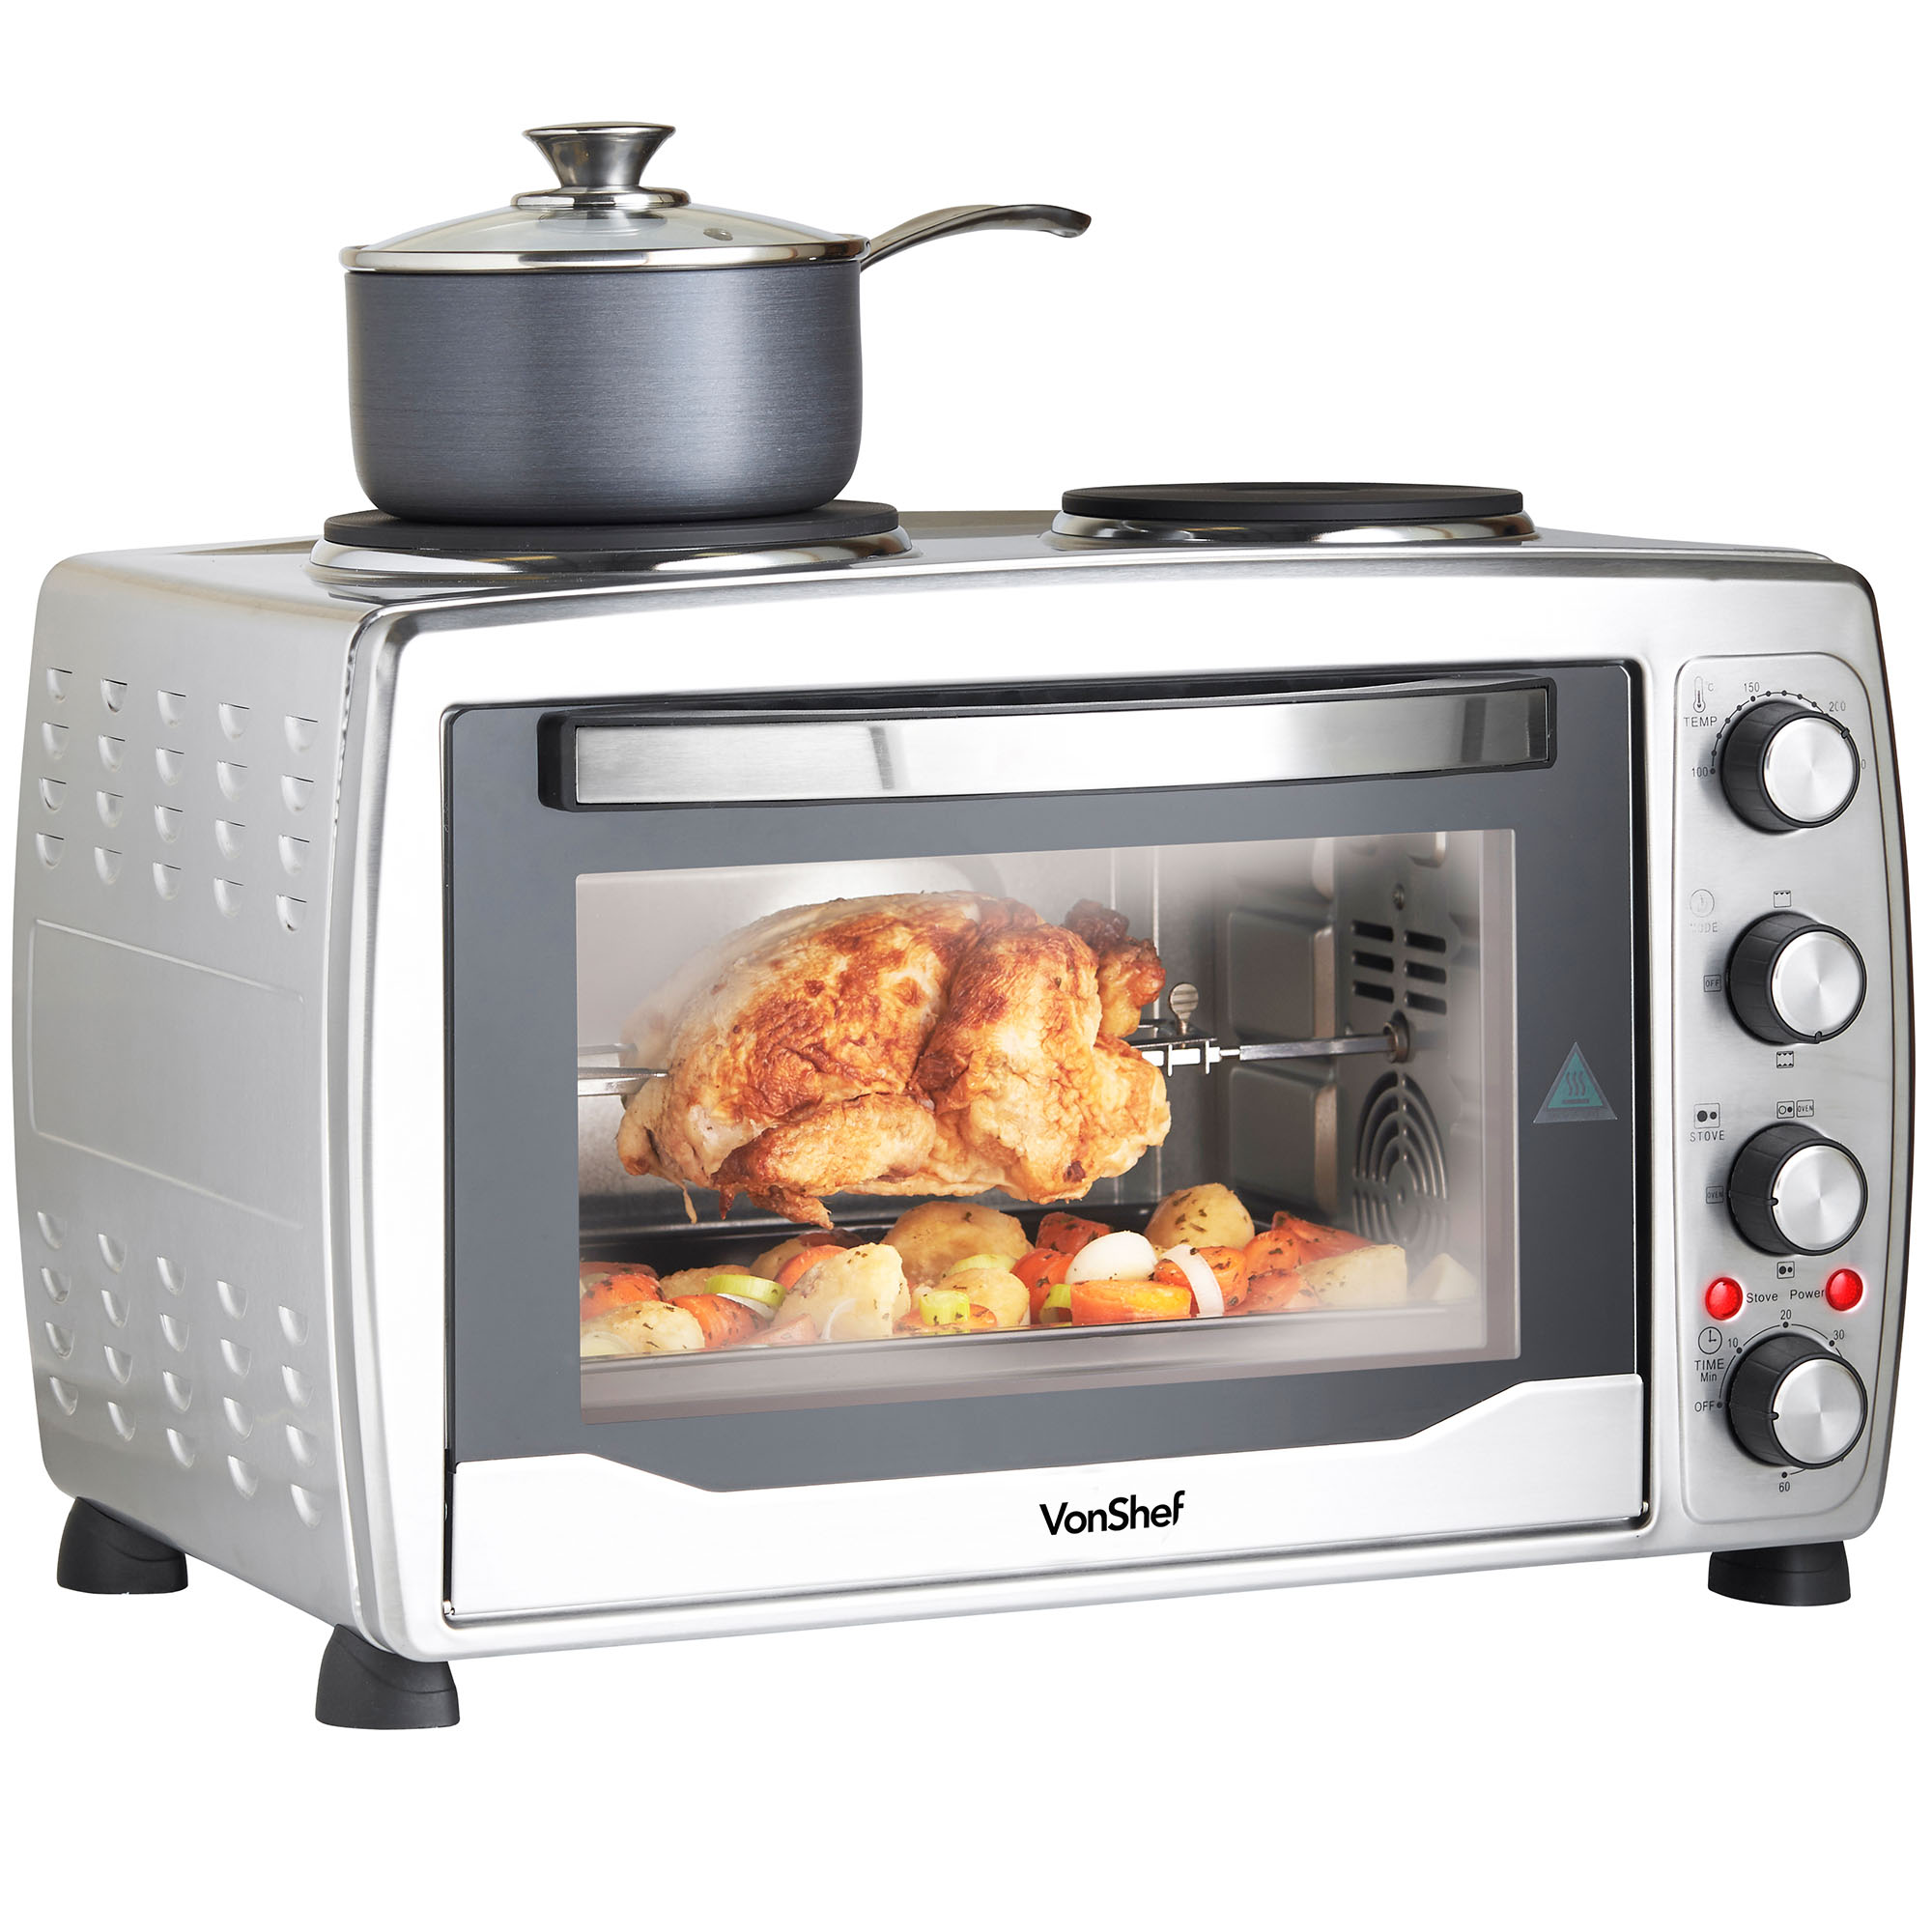 Mini Oven: VonShef Mini Oven 36 Litres Silver Convection Double Hob